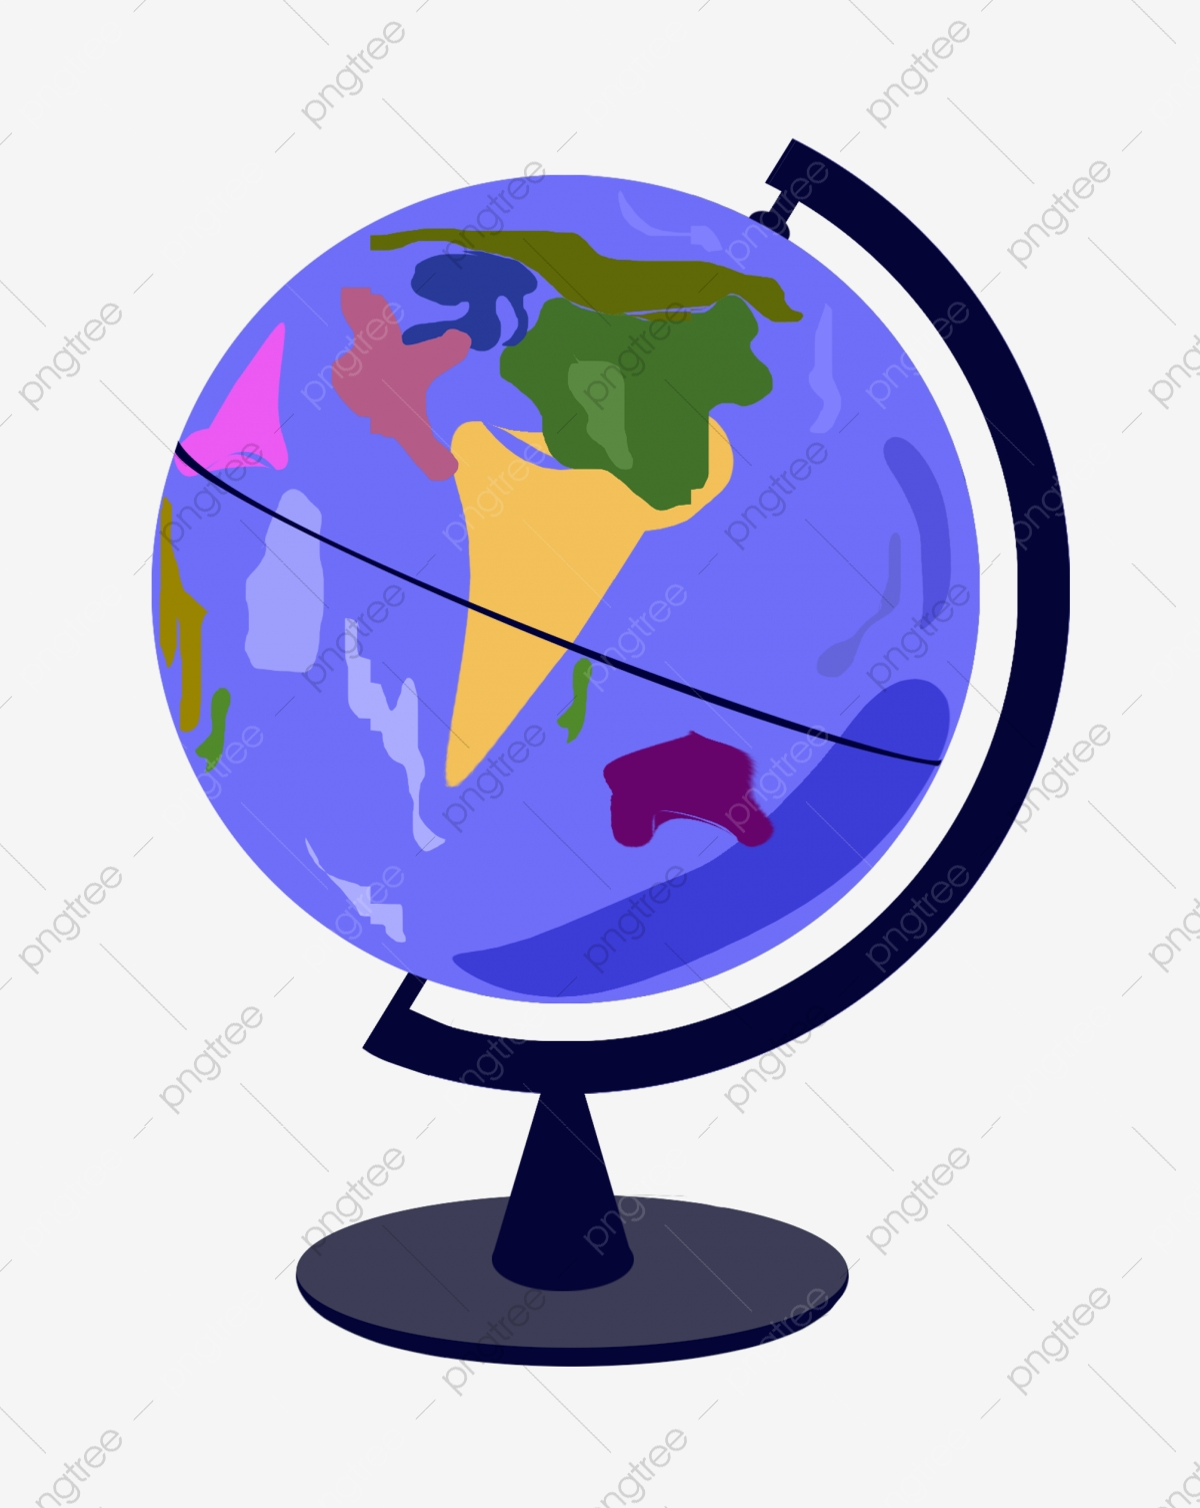 Cartoon Globe Model Illustration Globe Earth Office Png Transparent Clipart Image And Psd File For Free Download Doraemon batman new hindi episode like. https pngtree com freepng cartoon globe model illustration 4624014 html